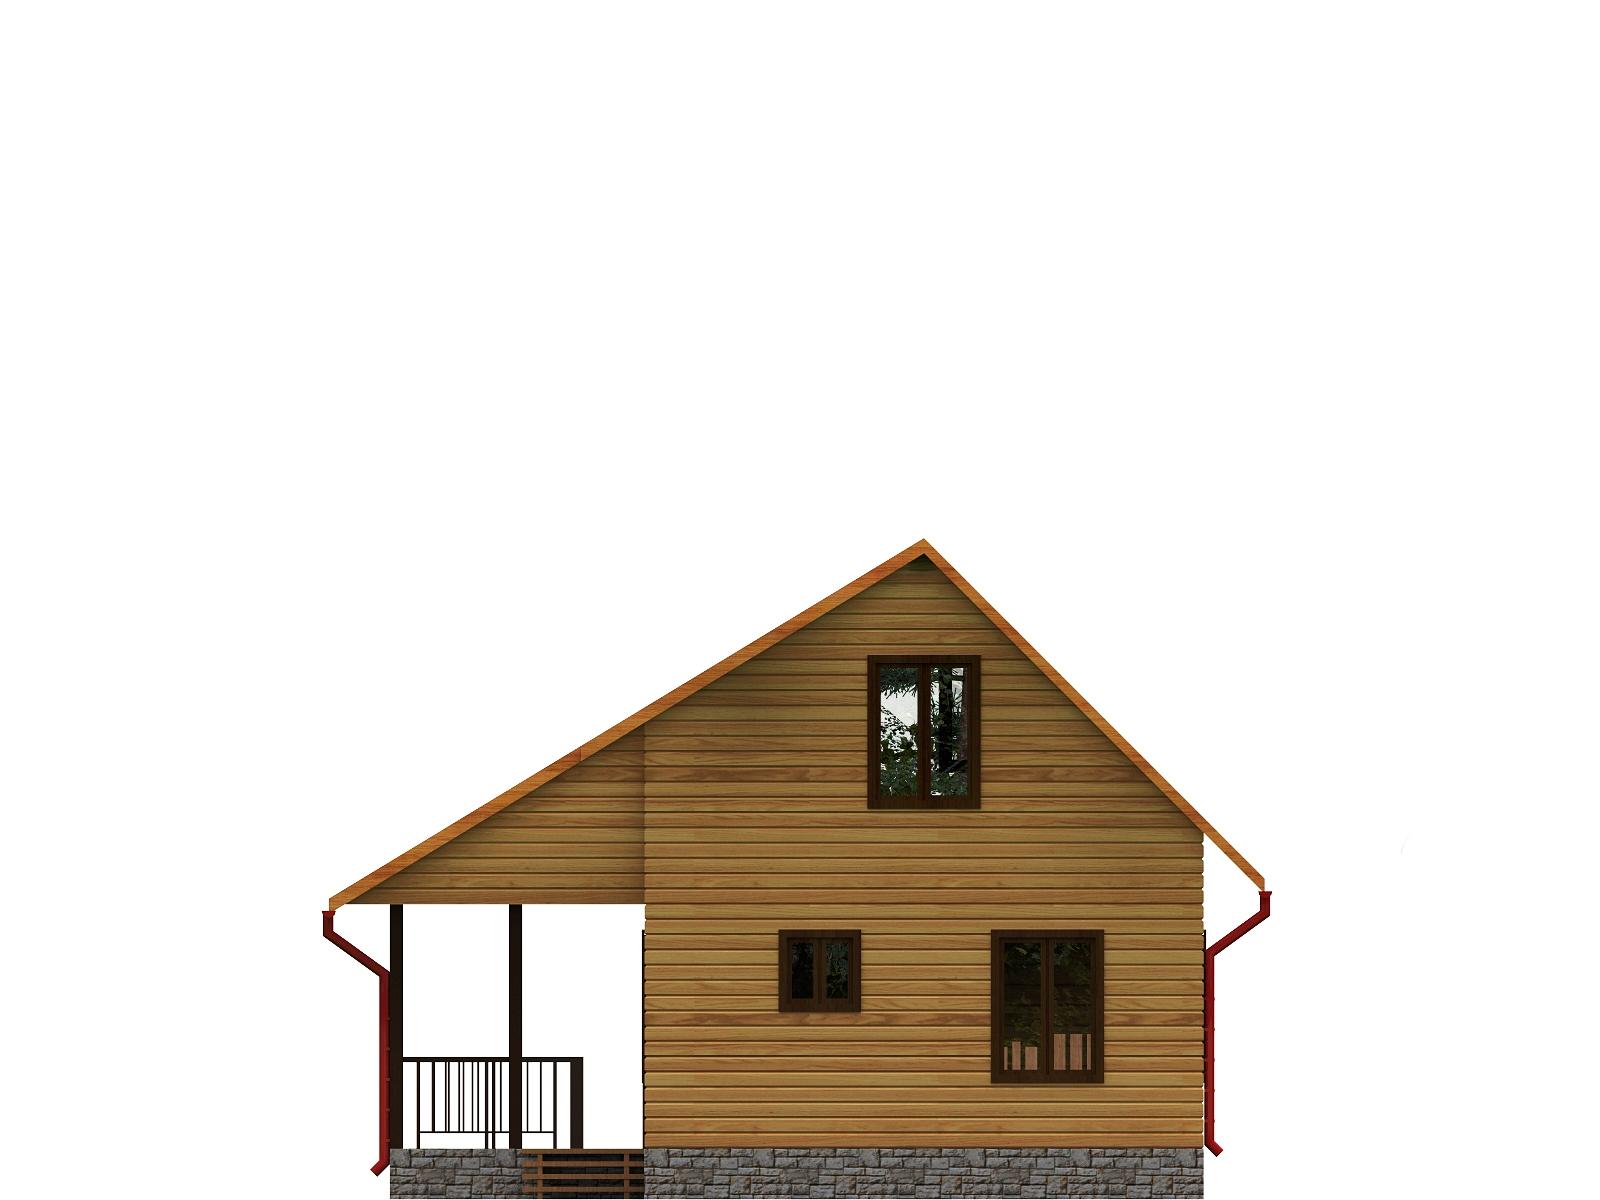 Проект дома из бруса 6,7х8 с мансардой. Разрез 2.